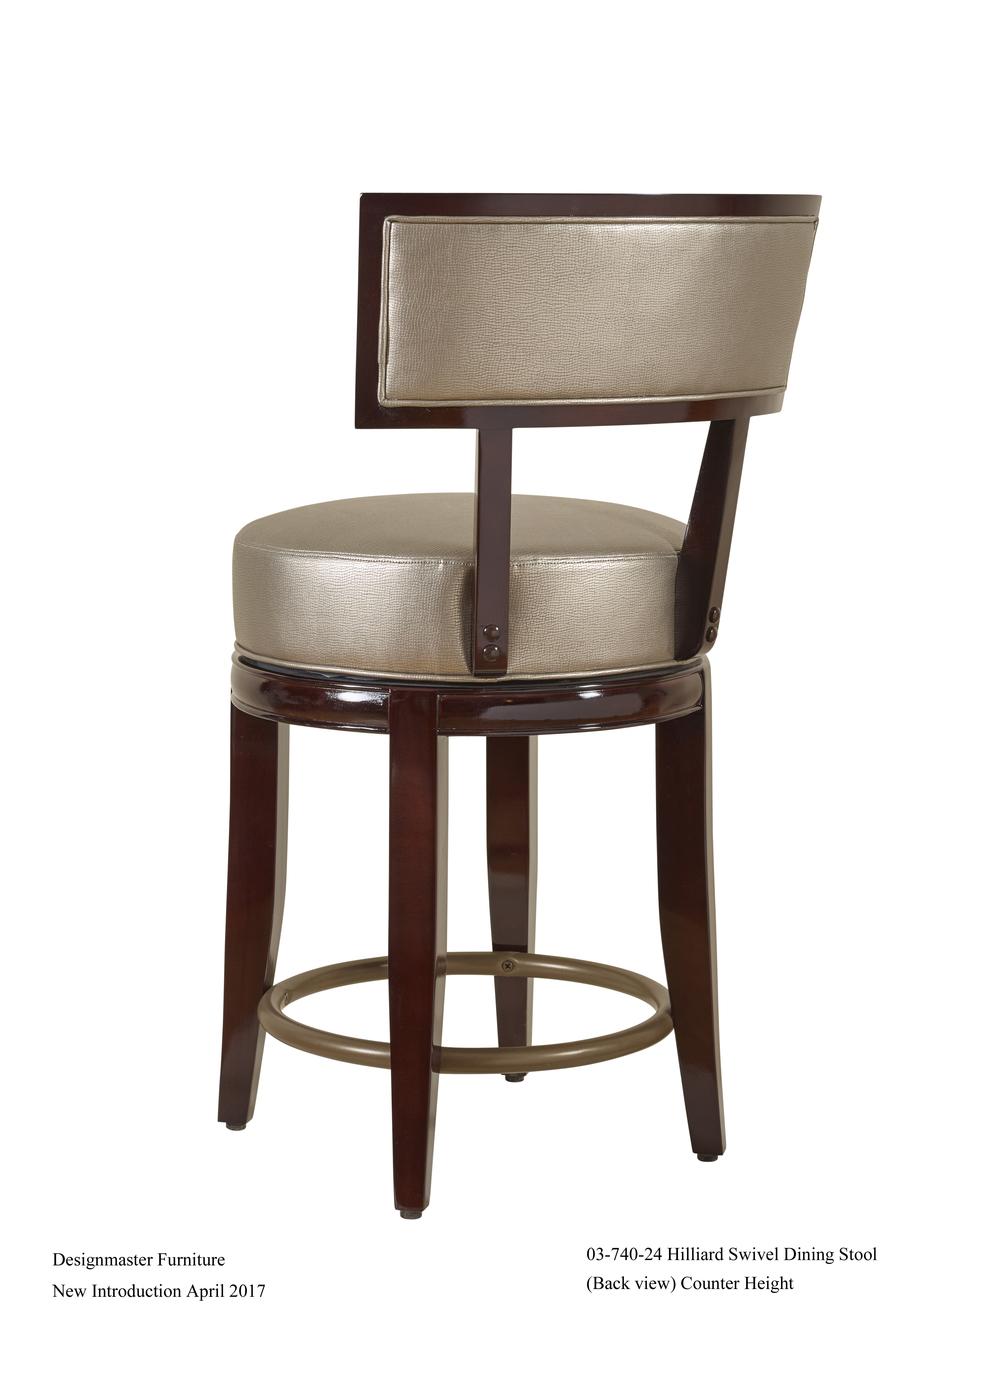 Designmaster Furniture - Hilliard Counter Stool